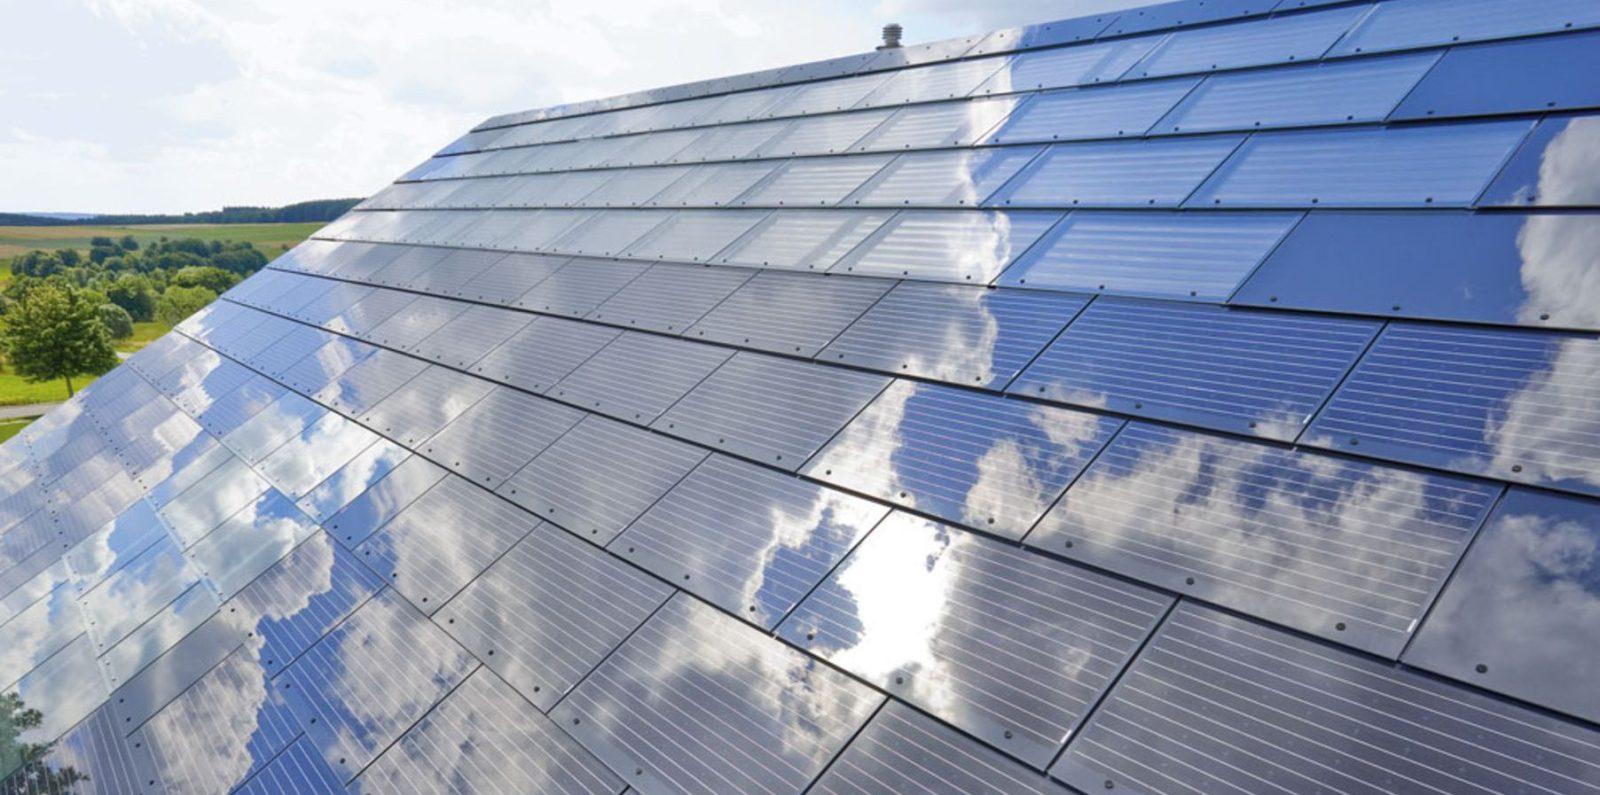 Elon Musk Solar Shingles >> Elon Musk Announces Solar Roof Product Tesla Solarcity